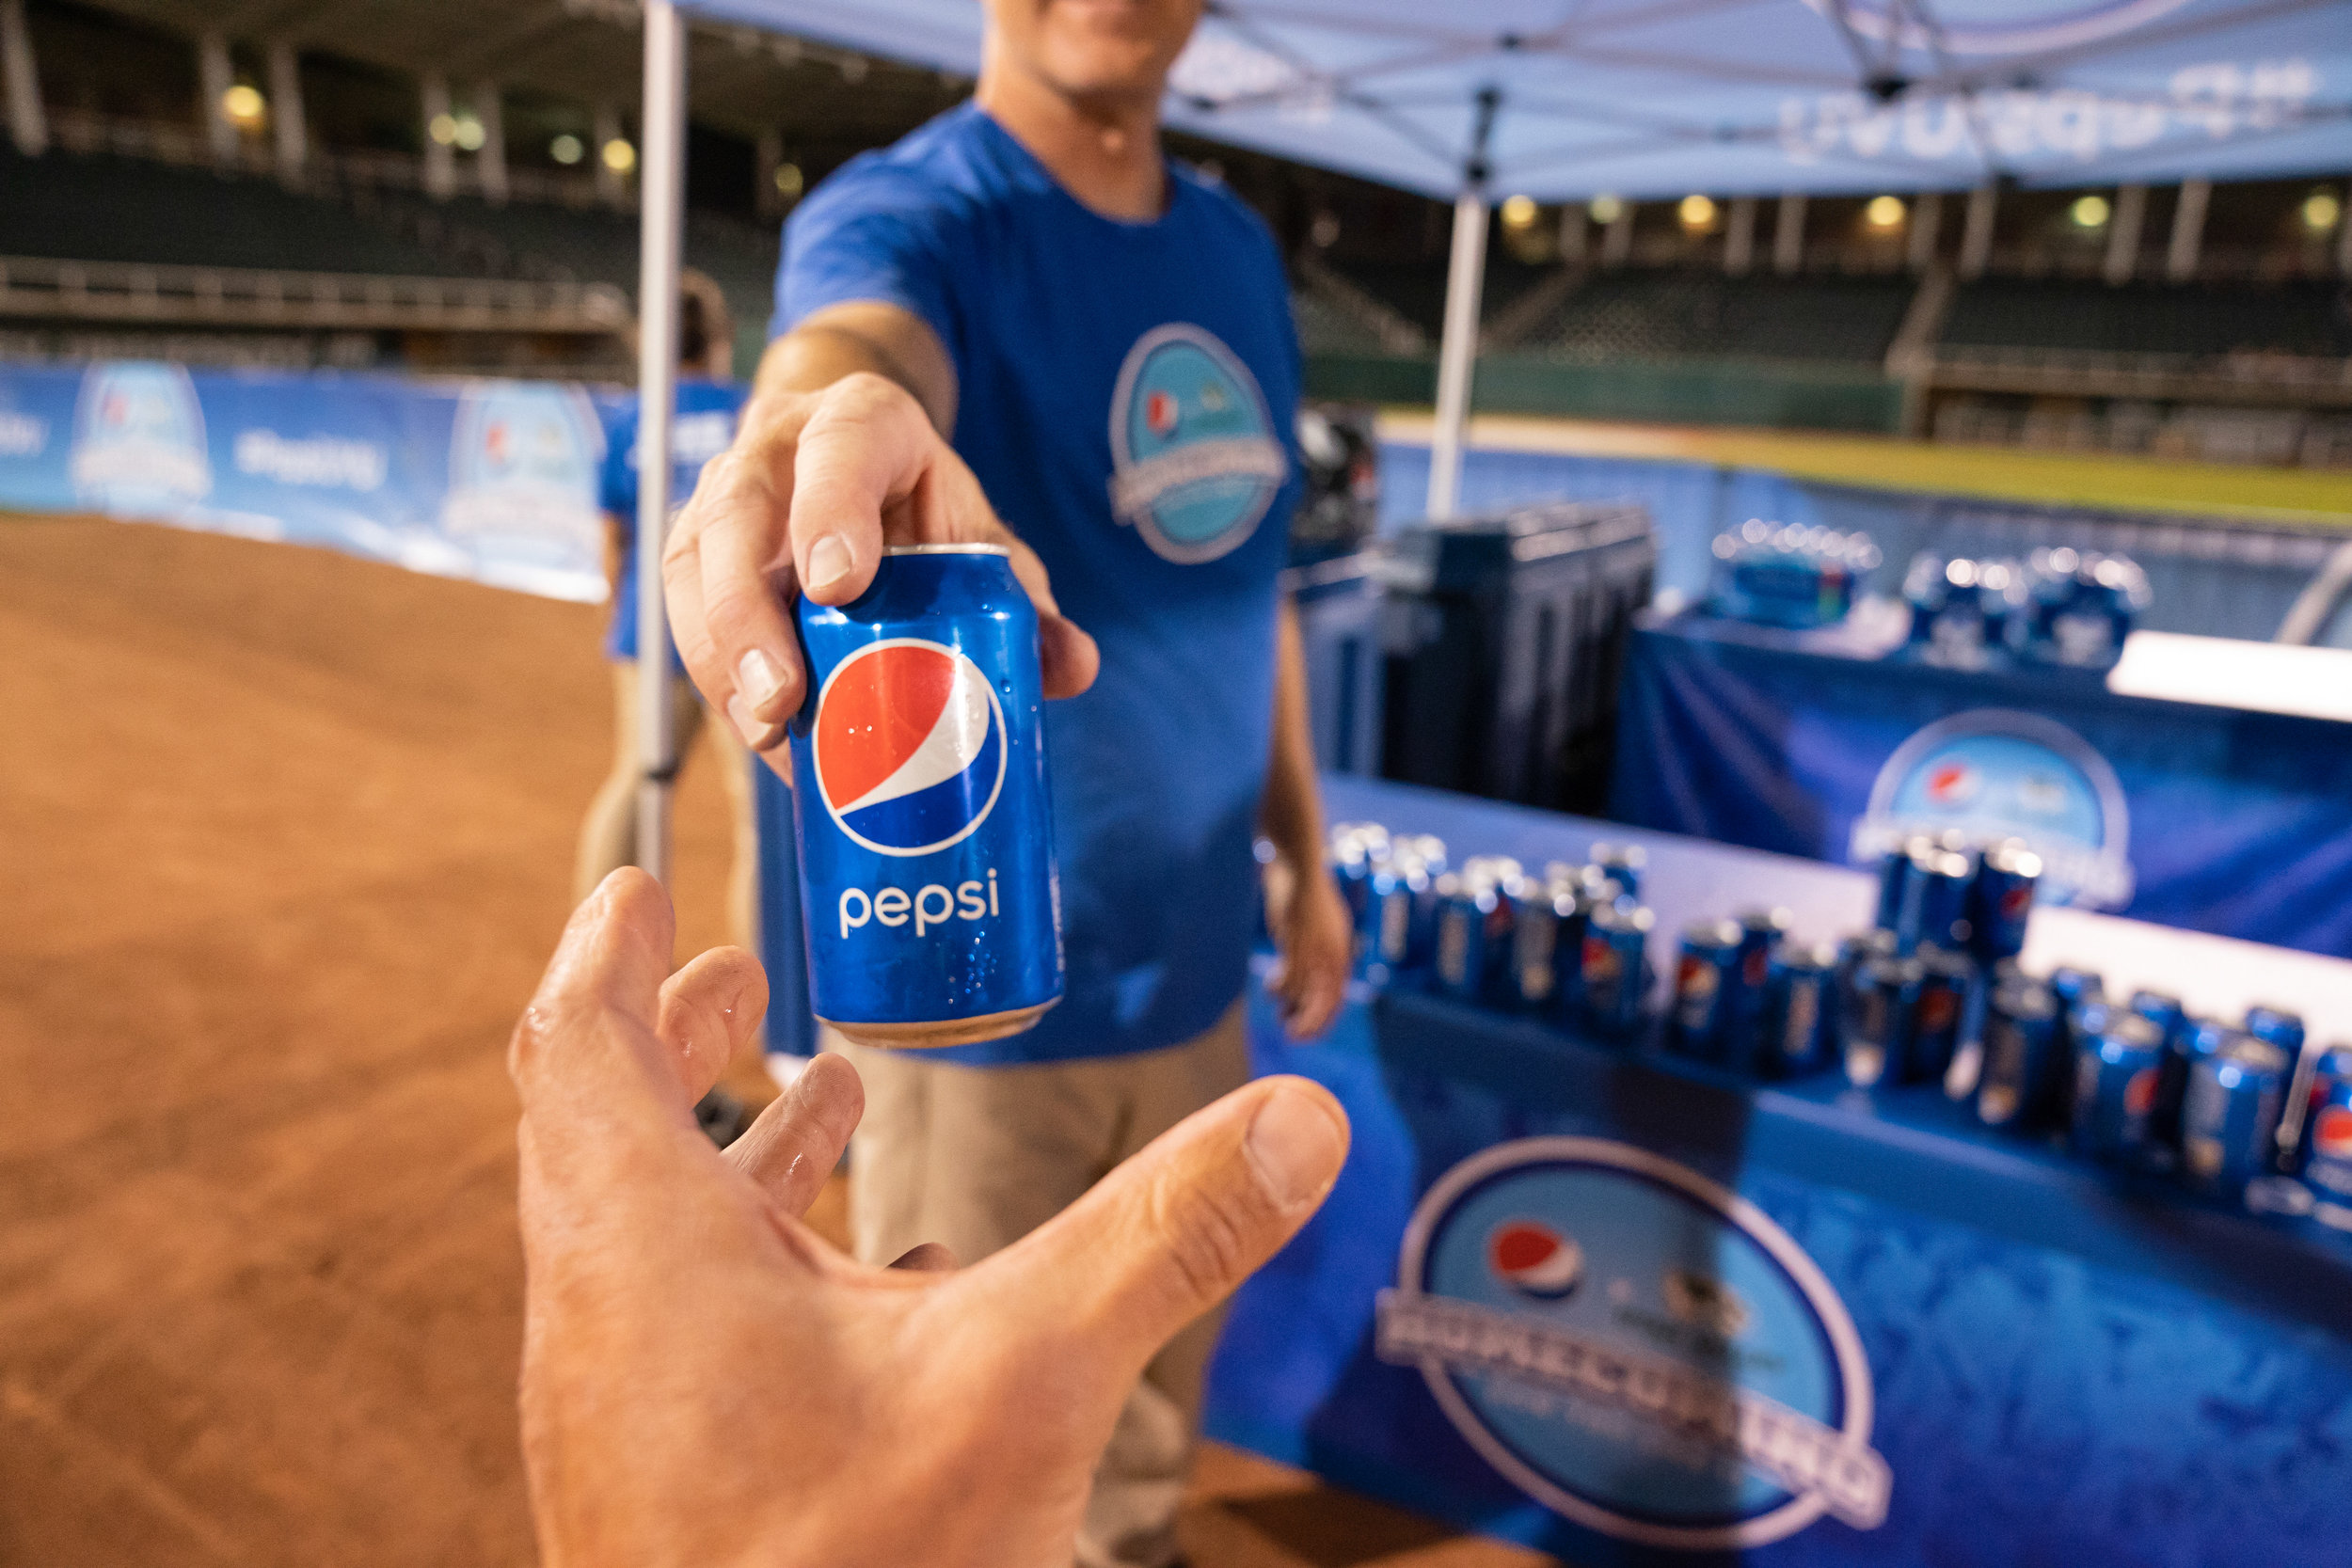 OHelloMedia-Pepsi-UVUHomecoming-9.29-0321.jpg